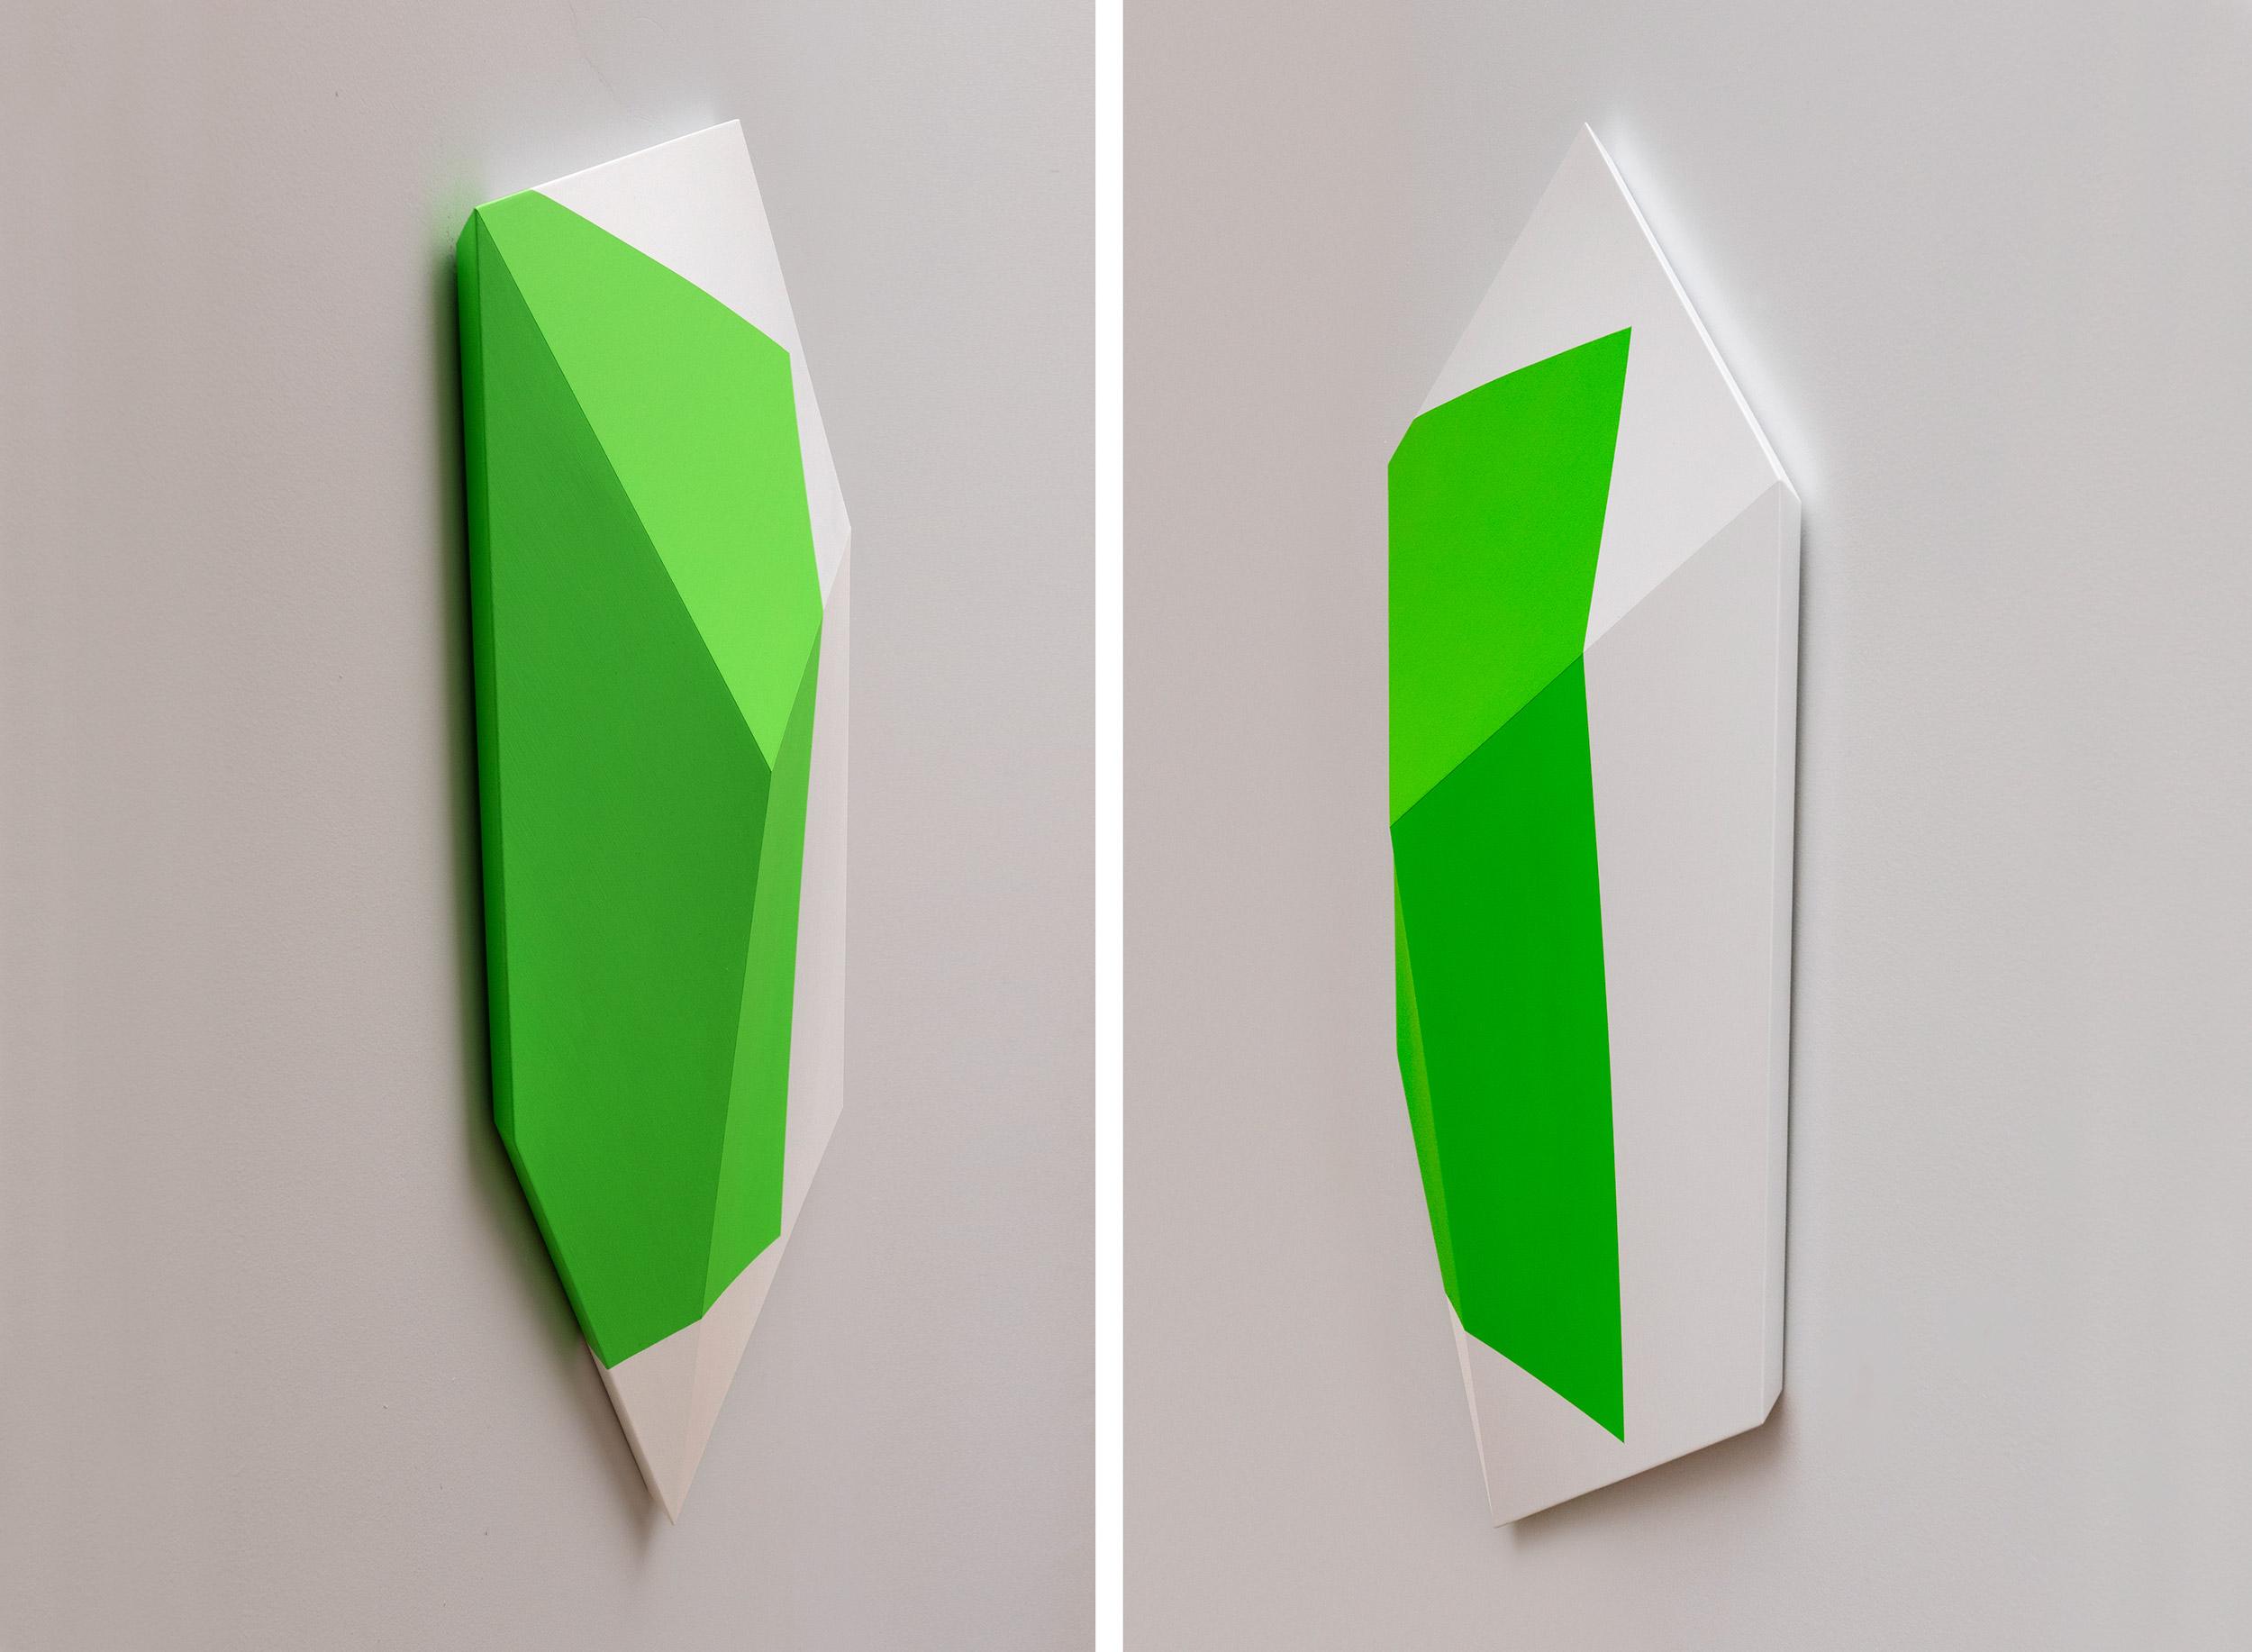 Green-Square-side-views.jpg